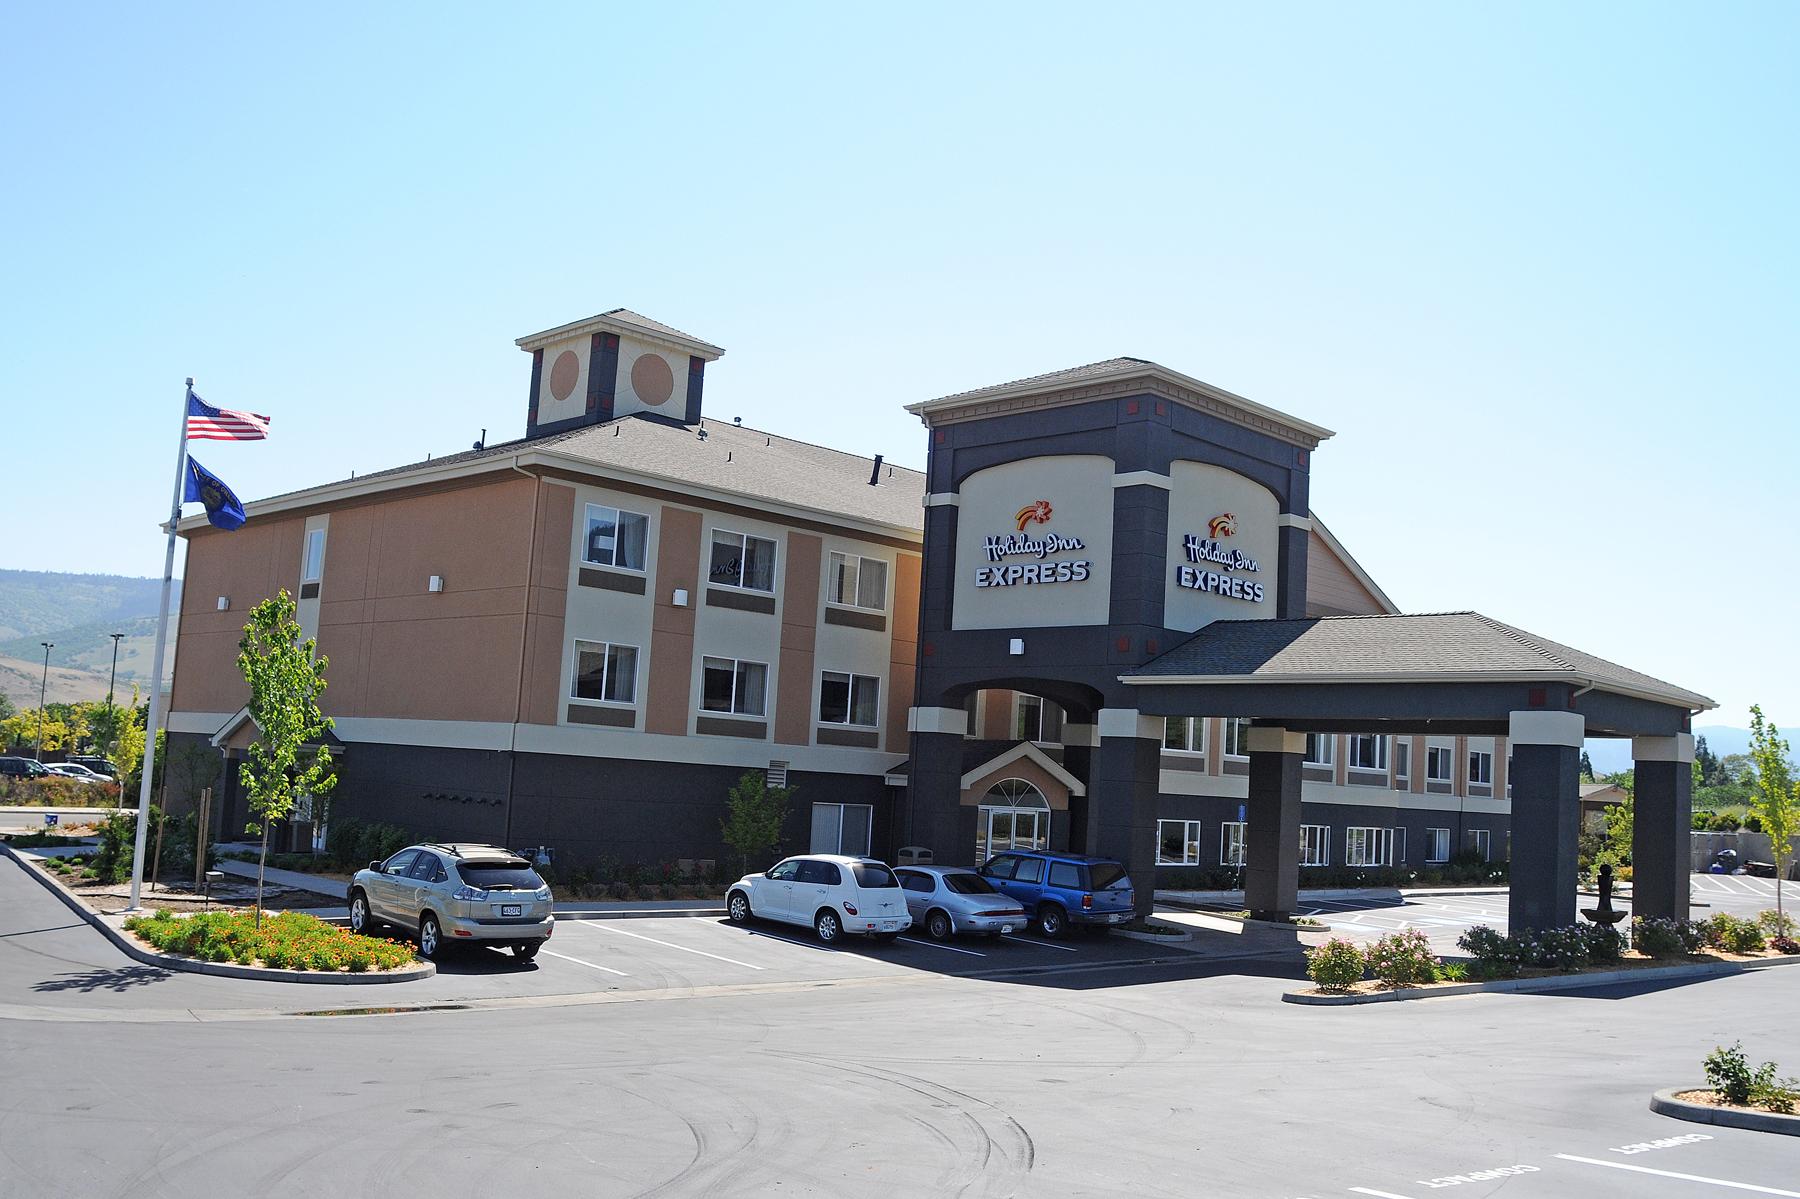 HIE Holiday Inn Ext DSC_3594web.jpg